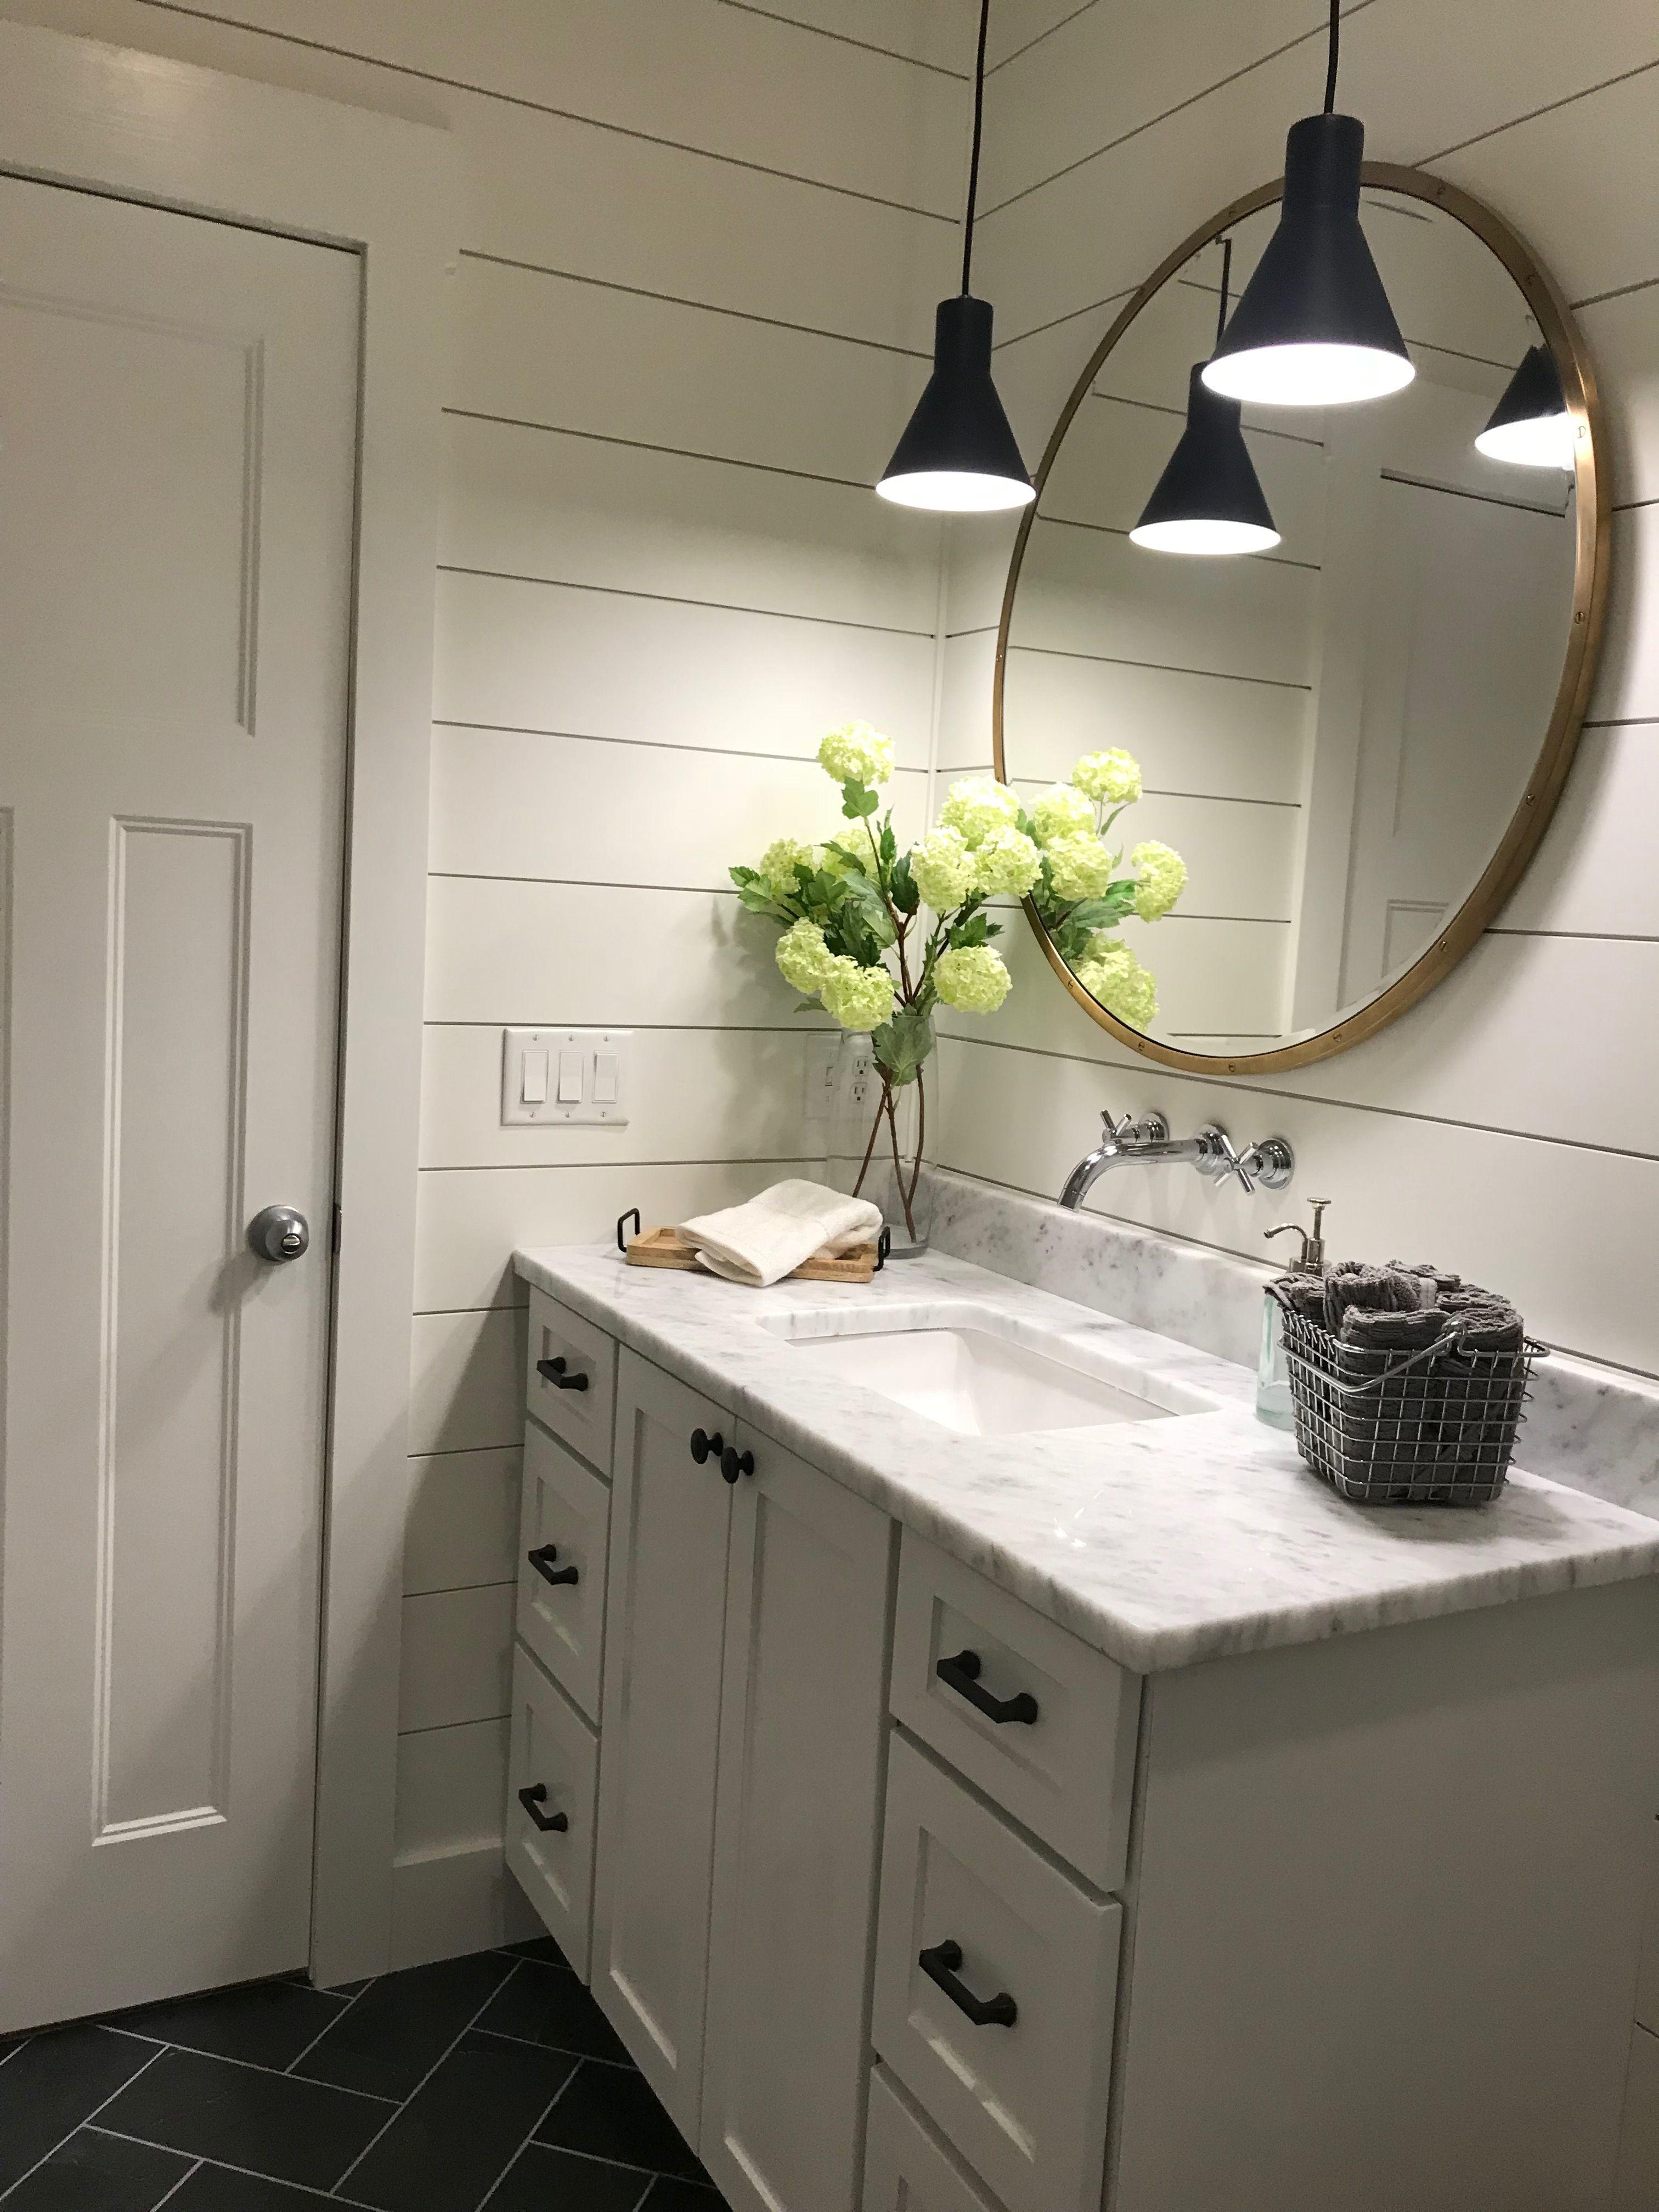 Shiplap Modern Farmhouse Round Mirror Brass Cottage Bathroom Design Ideas Small Bathroom Remodel Cottage Bathroom